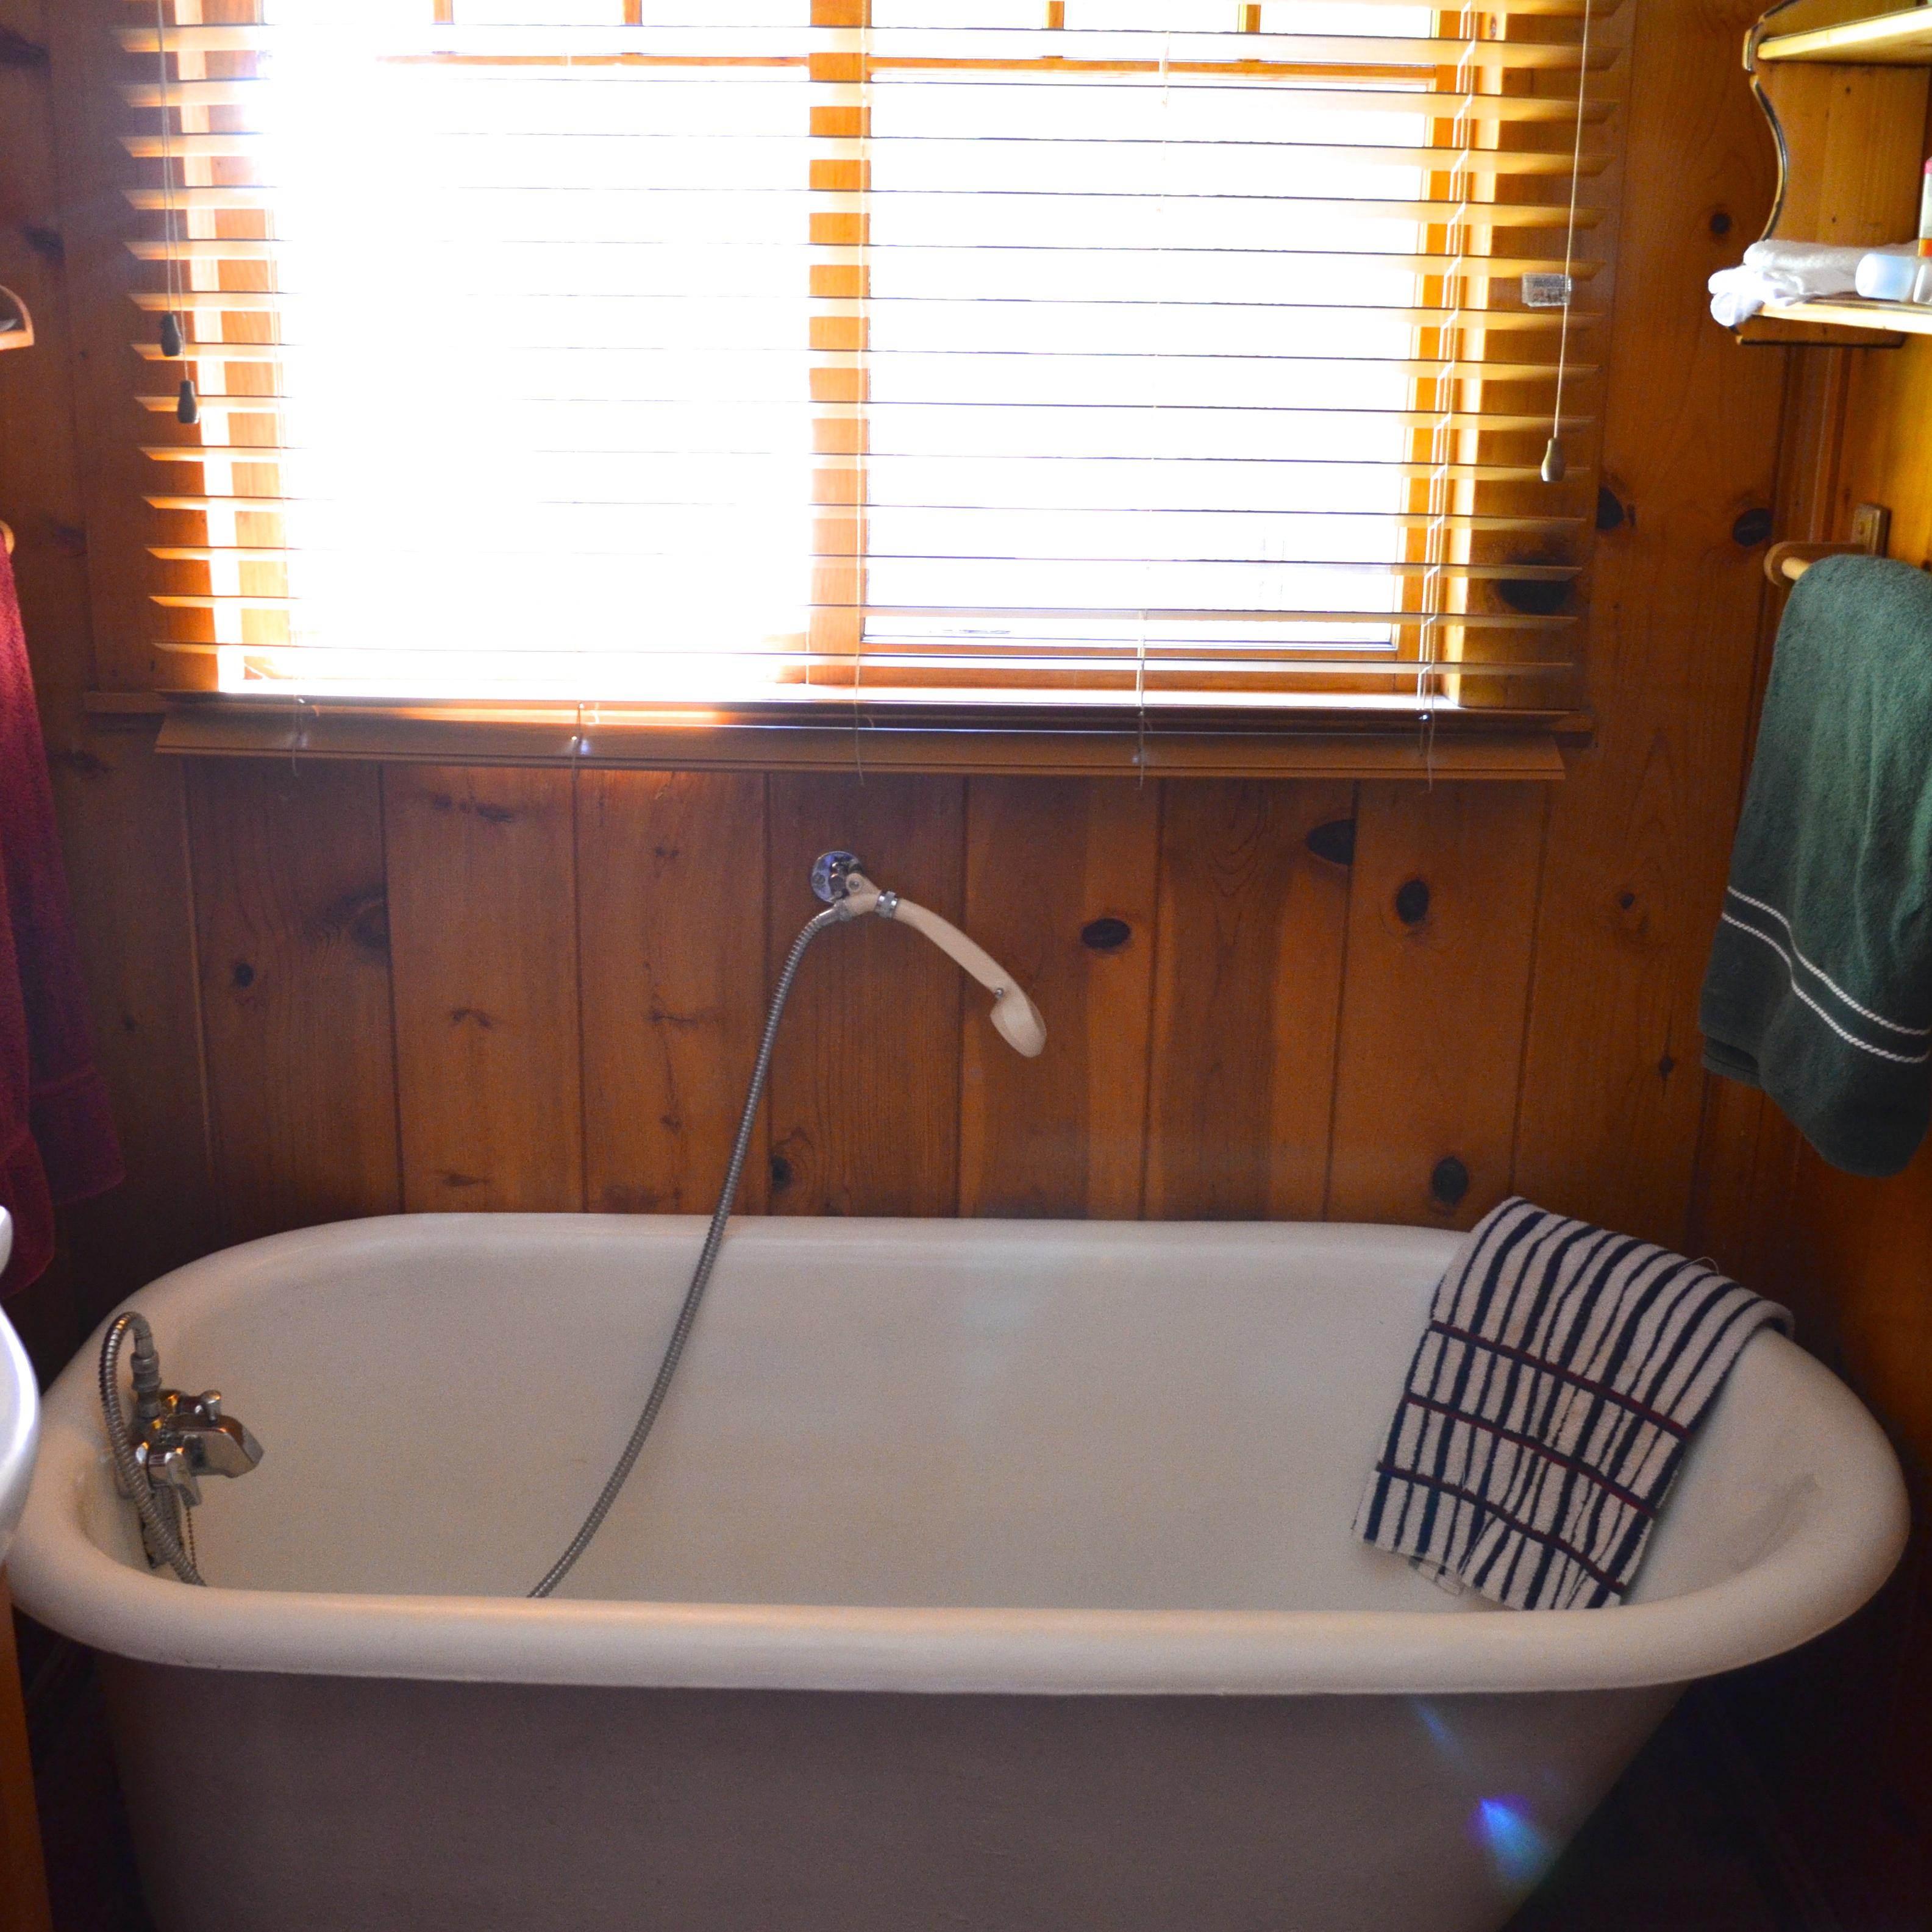 Introducing My Log Cabin Bathroom Renovation After